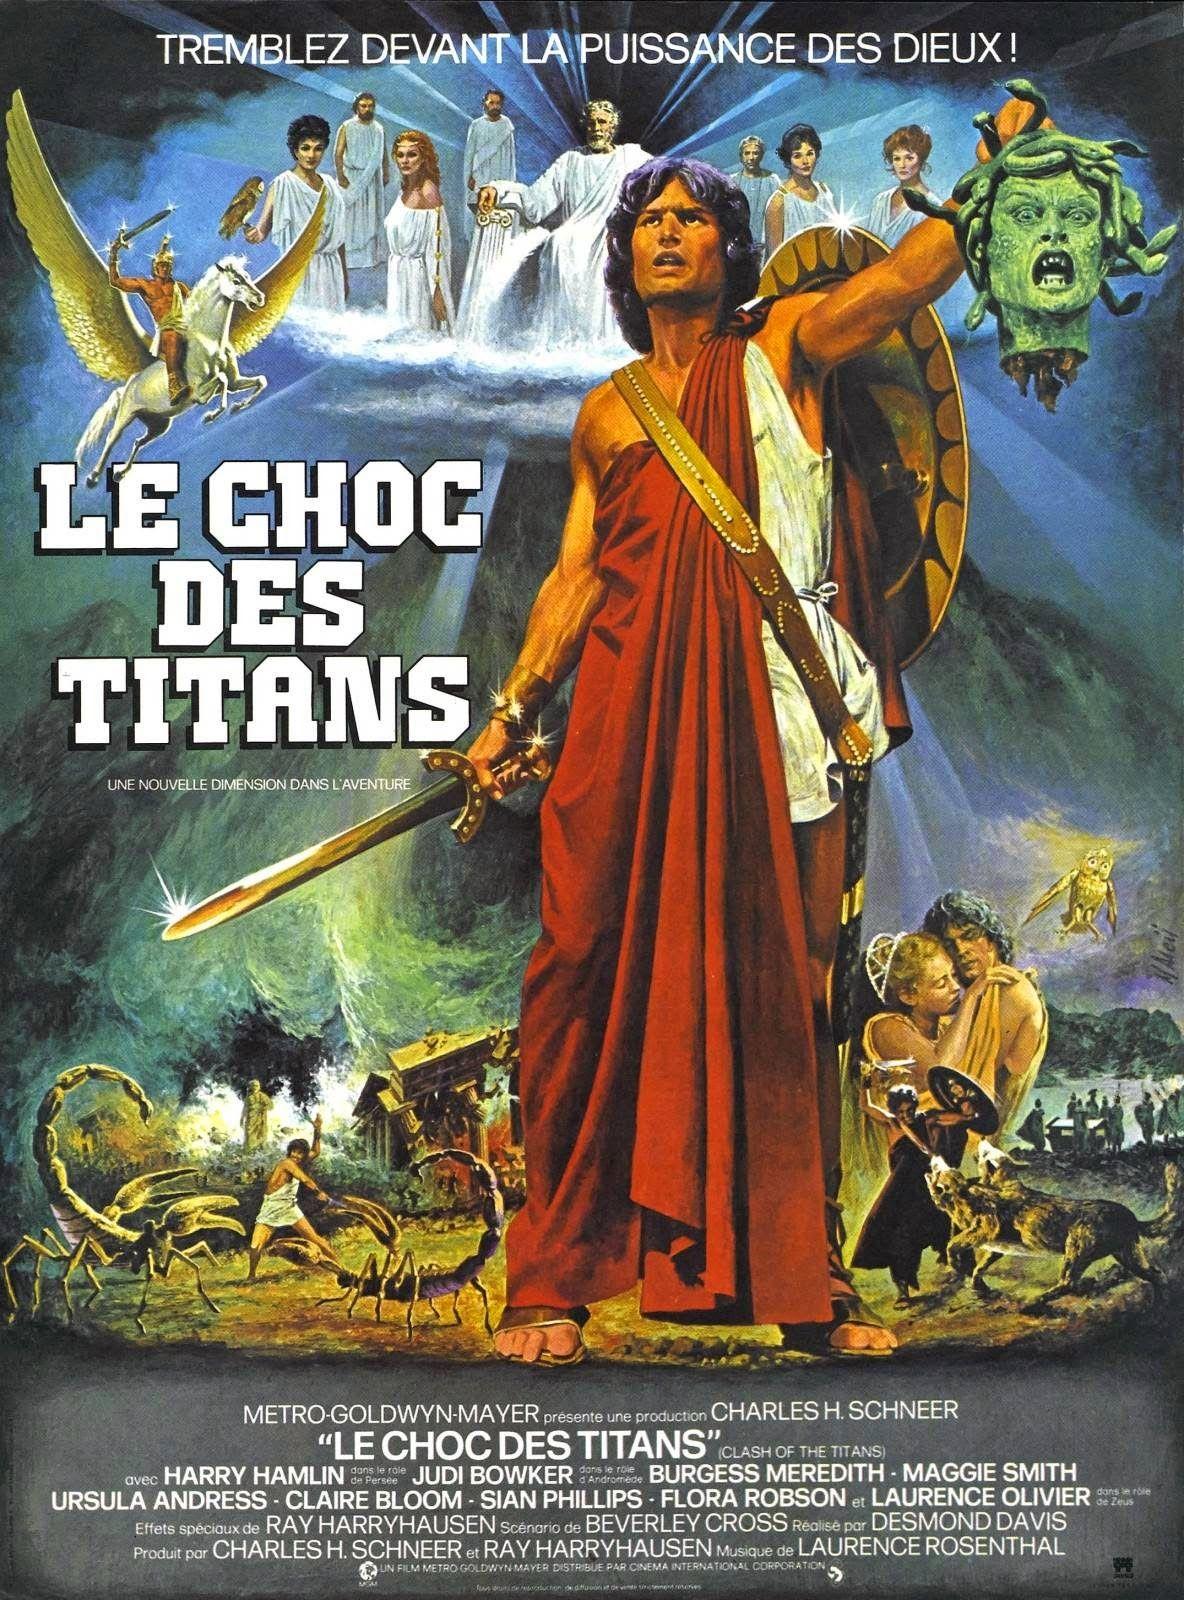 Le Choc Des Titans Streaming : titans, streaming, Harryhausen's, Clash, Titans, (1981), Titans,, Fantastique,